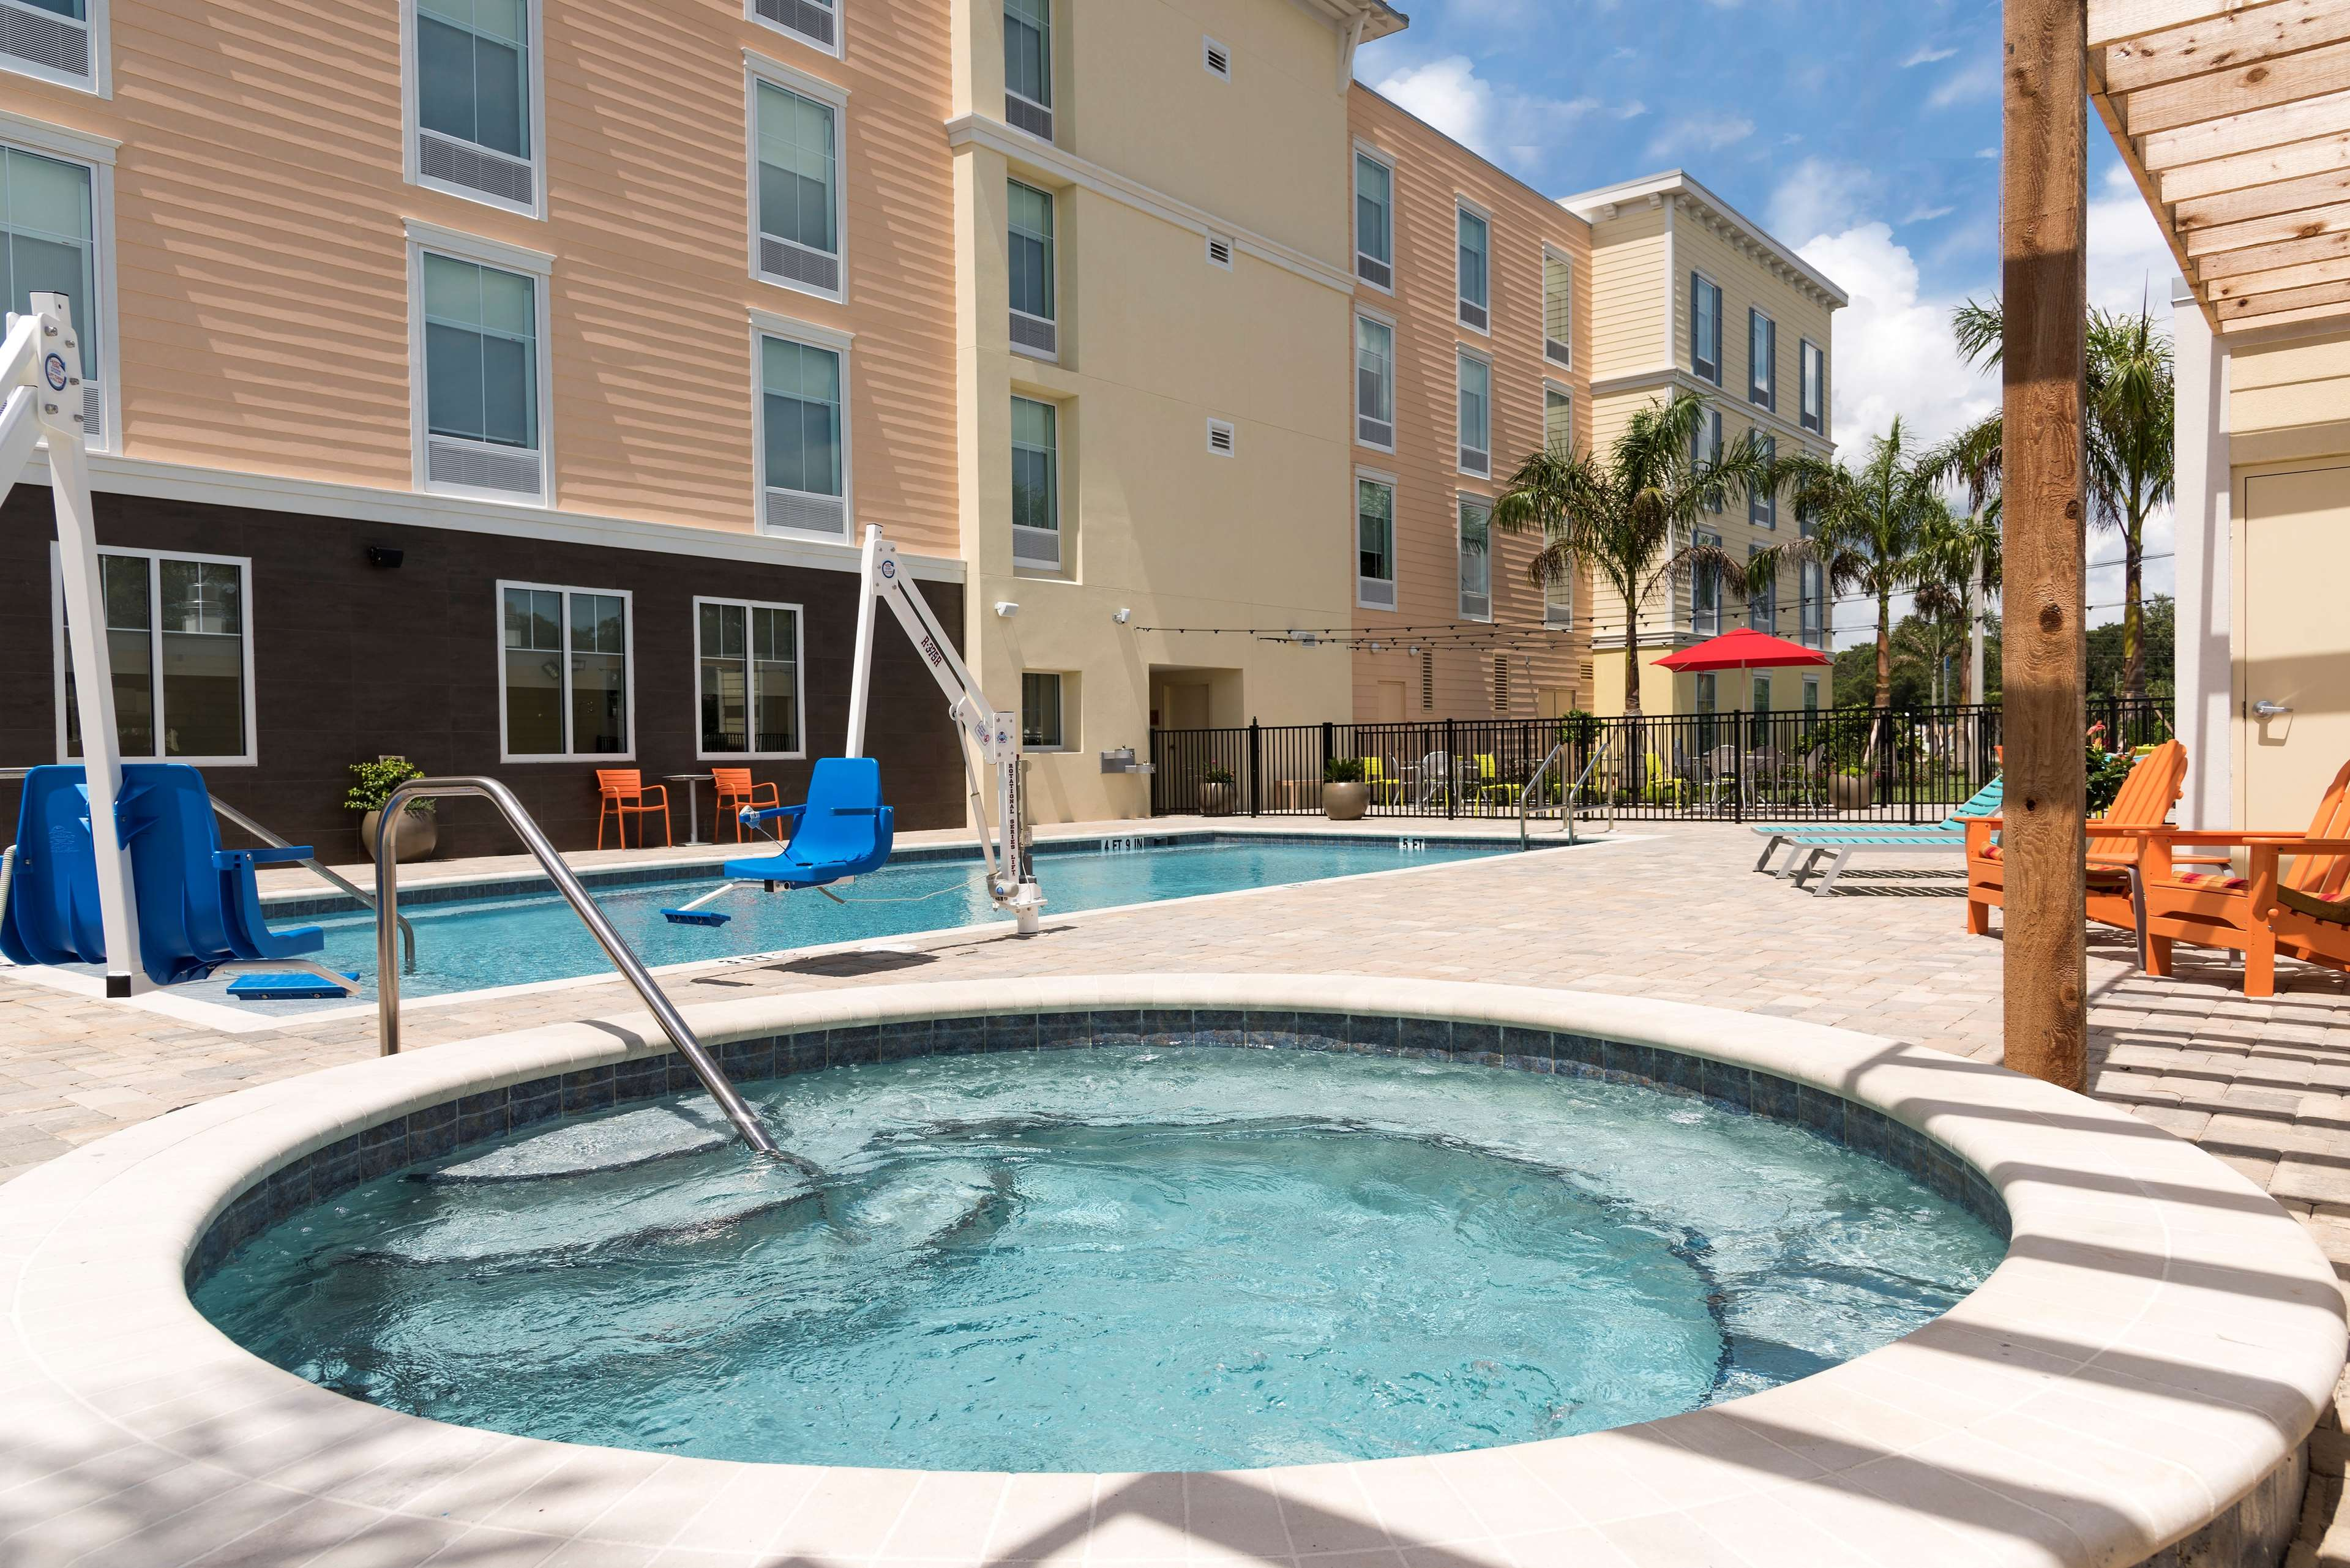 Home2 Suites by Hilton Nokomis Sarasota Casey Key image 20